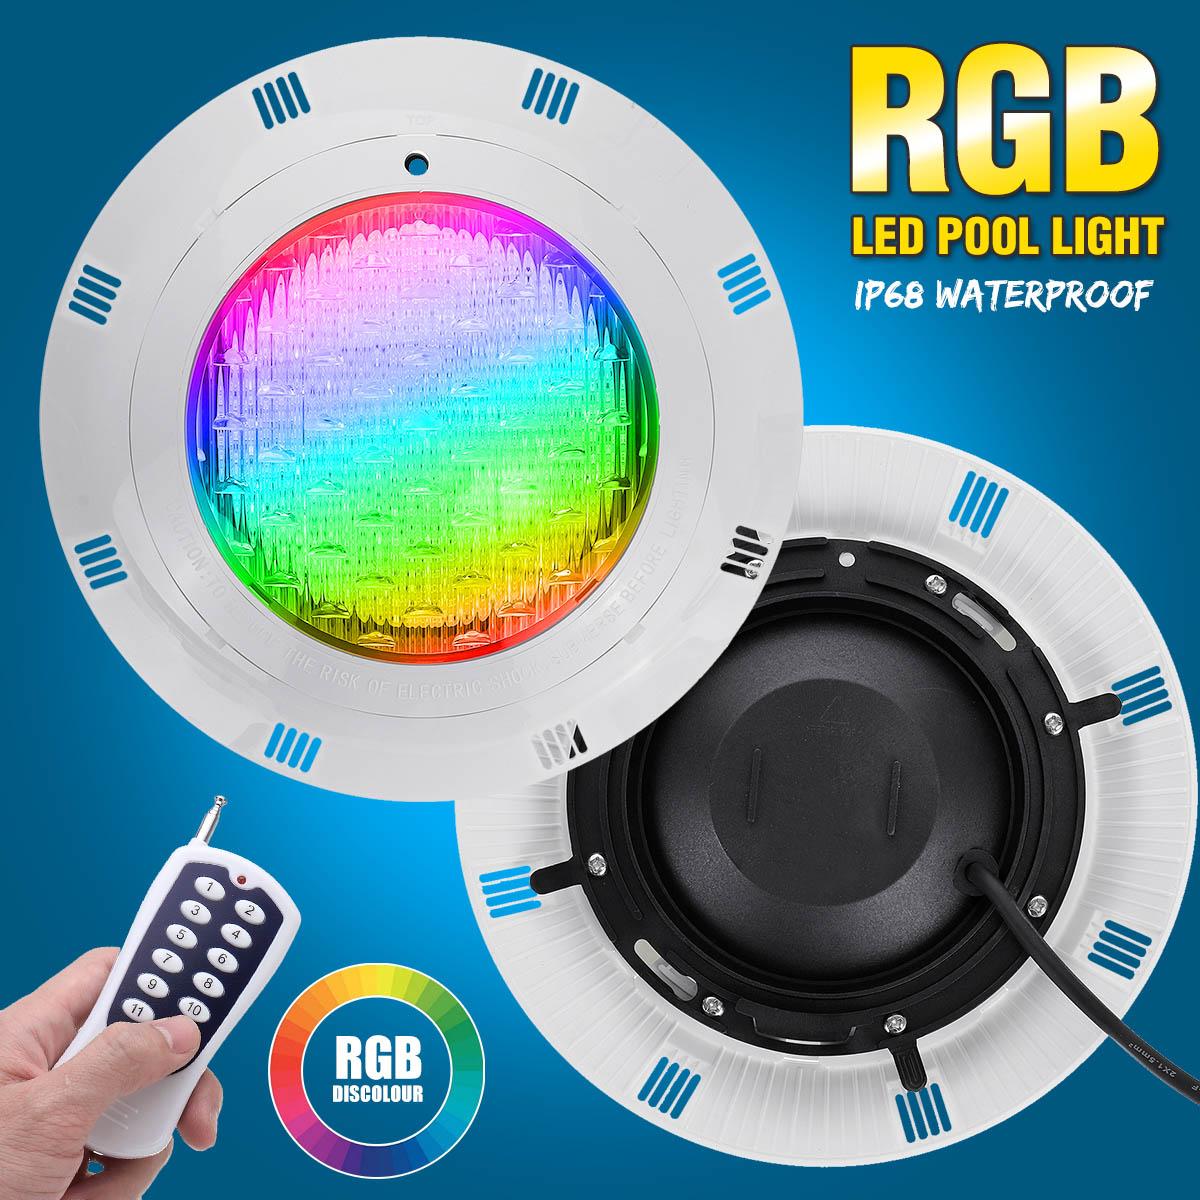 45W RGB Led yüzme havuz ışığı 450LED IP68 su geçirmez AC/DC12V-24V açık RGB sualtı ışığı gölet Led Piscina Luz spot